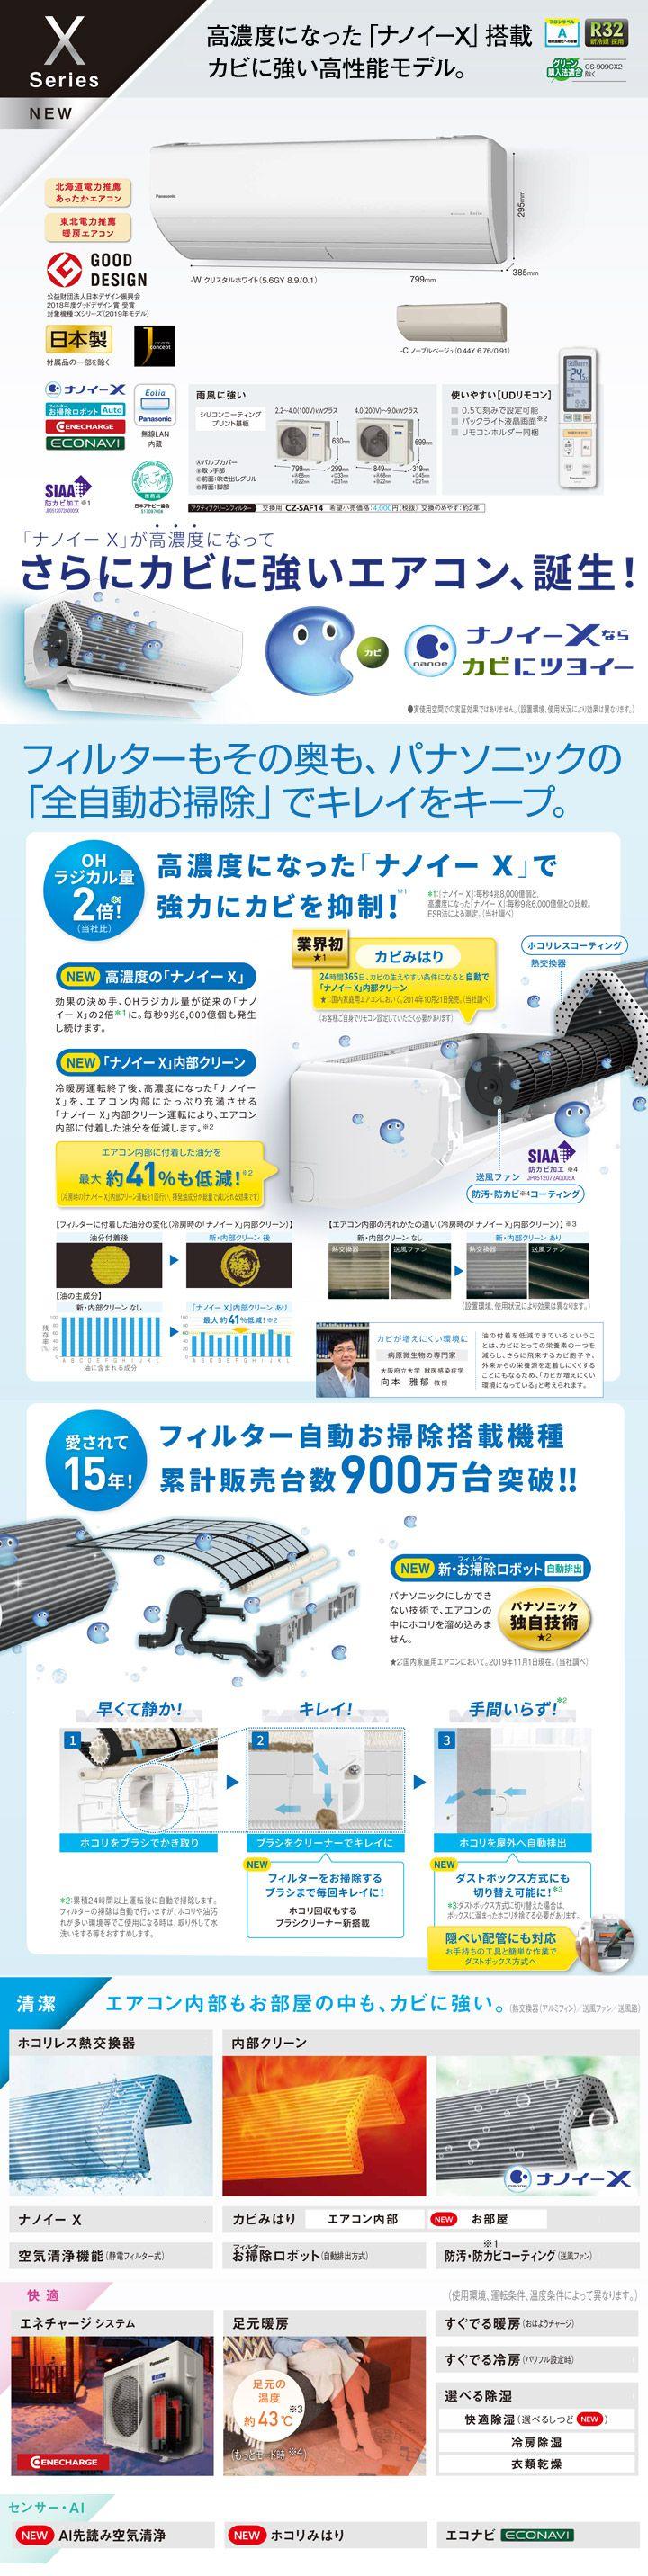 XCS-289CX-W/Sカタログ